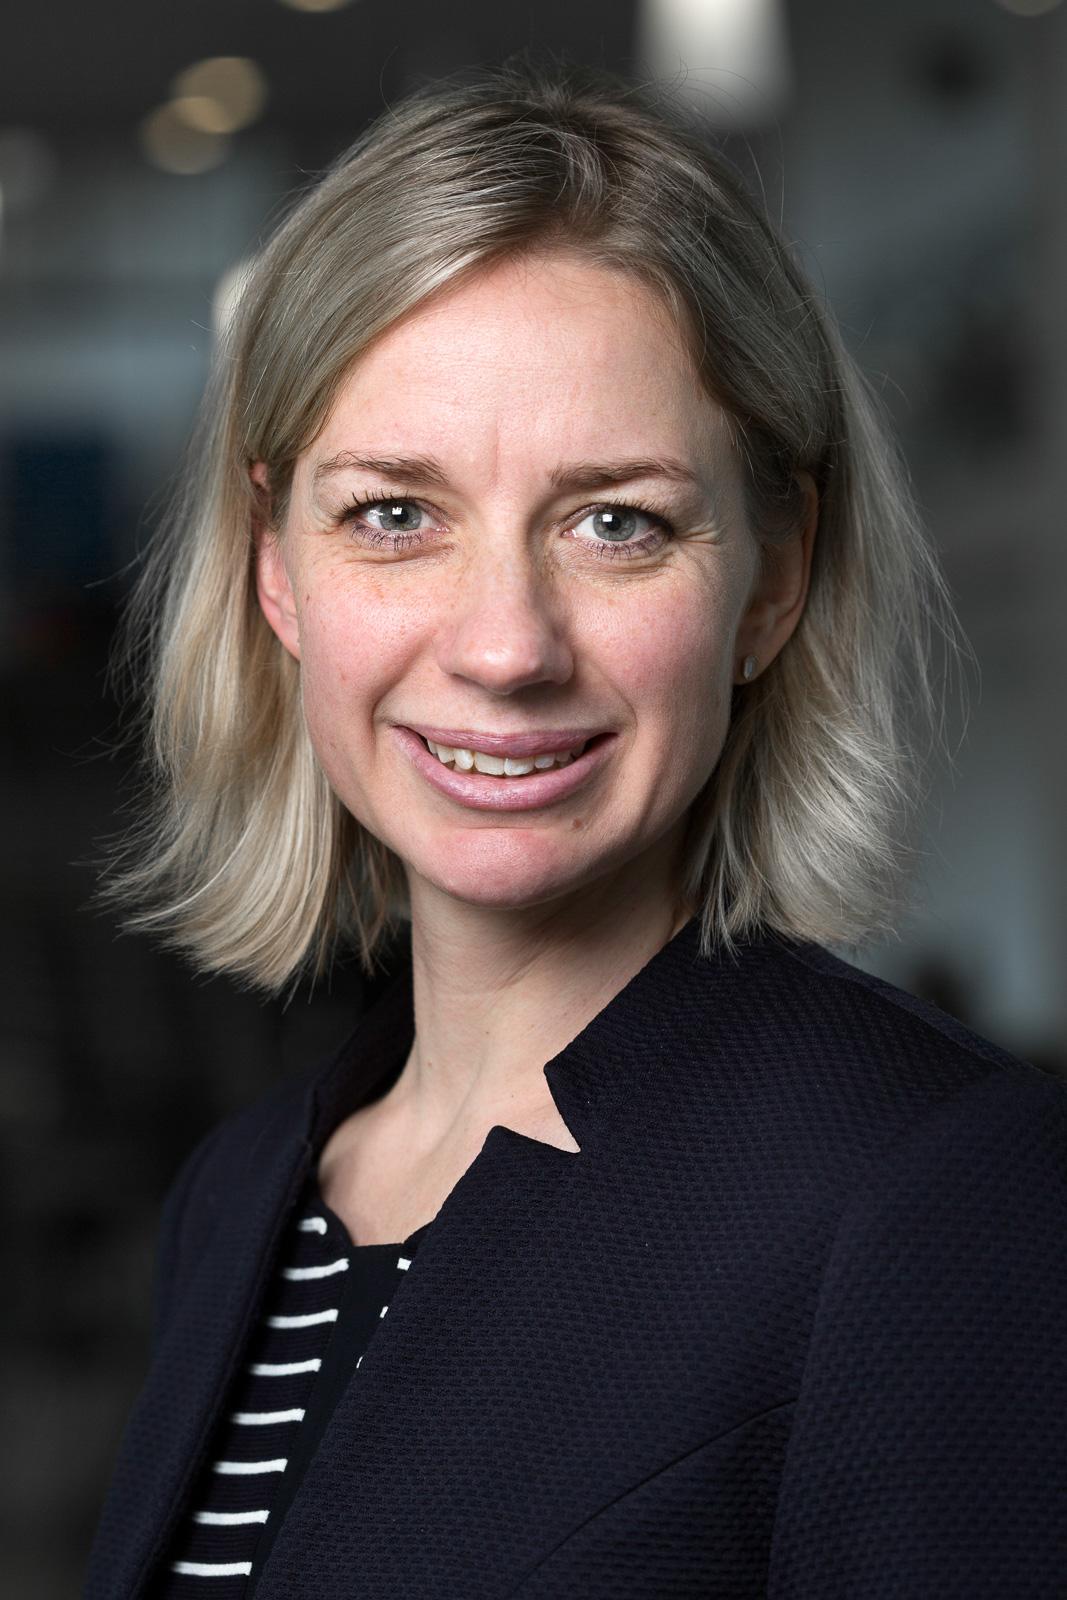 Franziska Günzel-Jensen